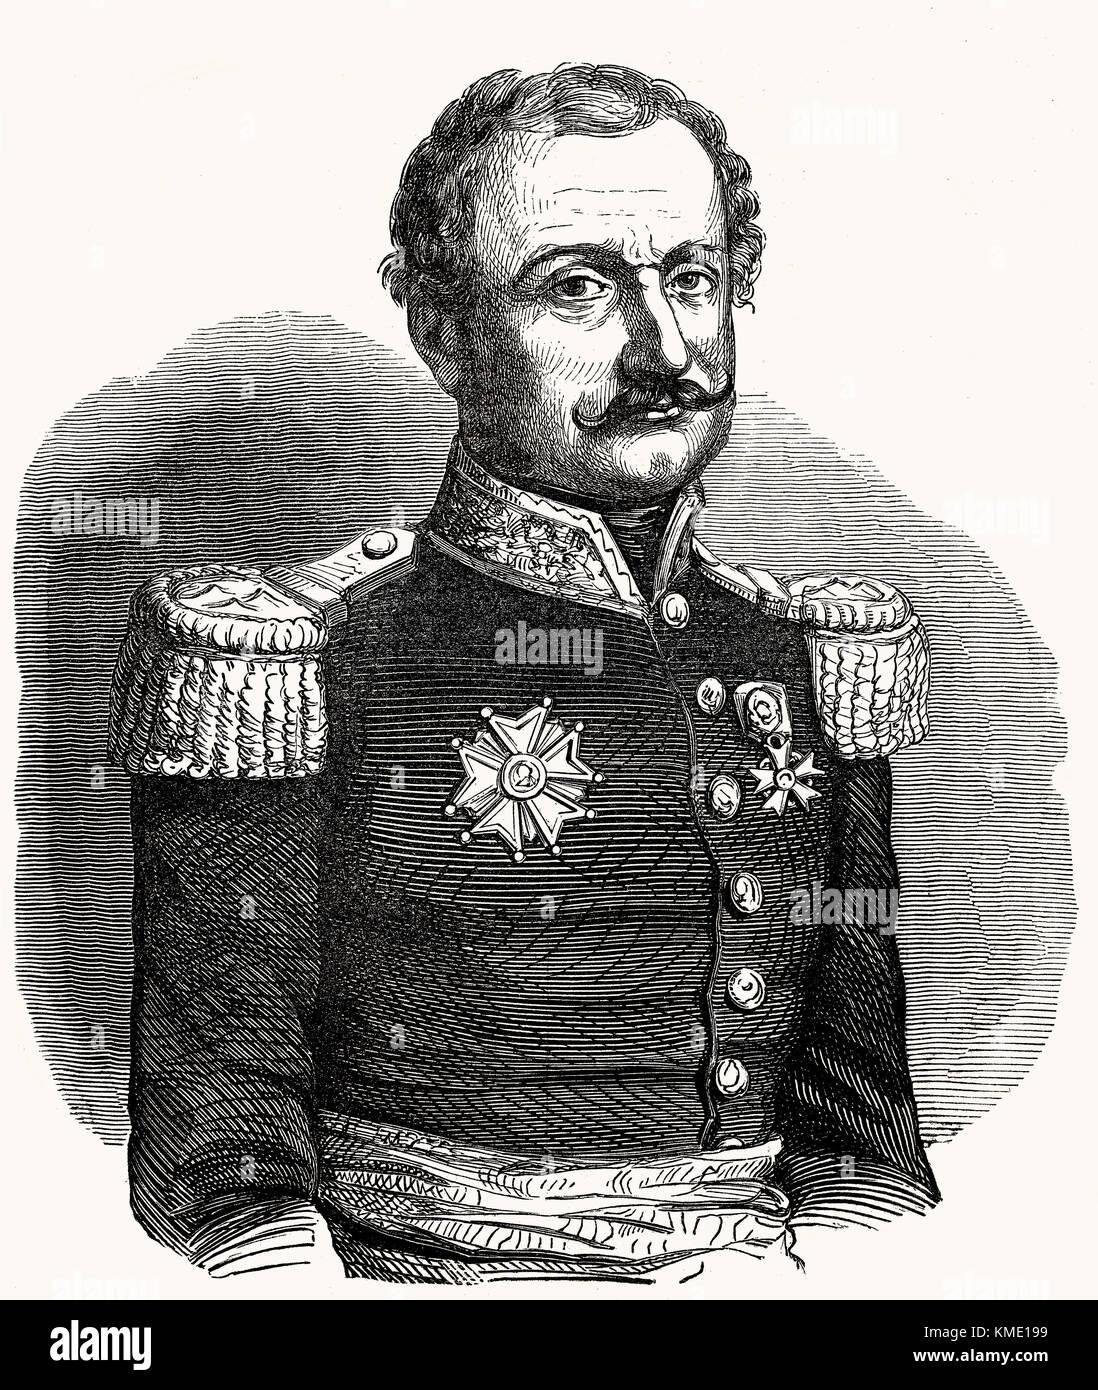 French commander and marshal General Nicolas Charles Victor Oudinot, Duke of Reggio, 1791 - 1863 - Stock Image